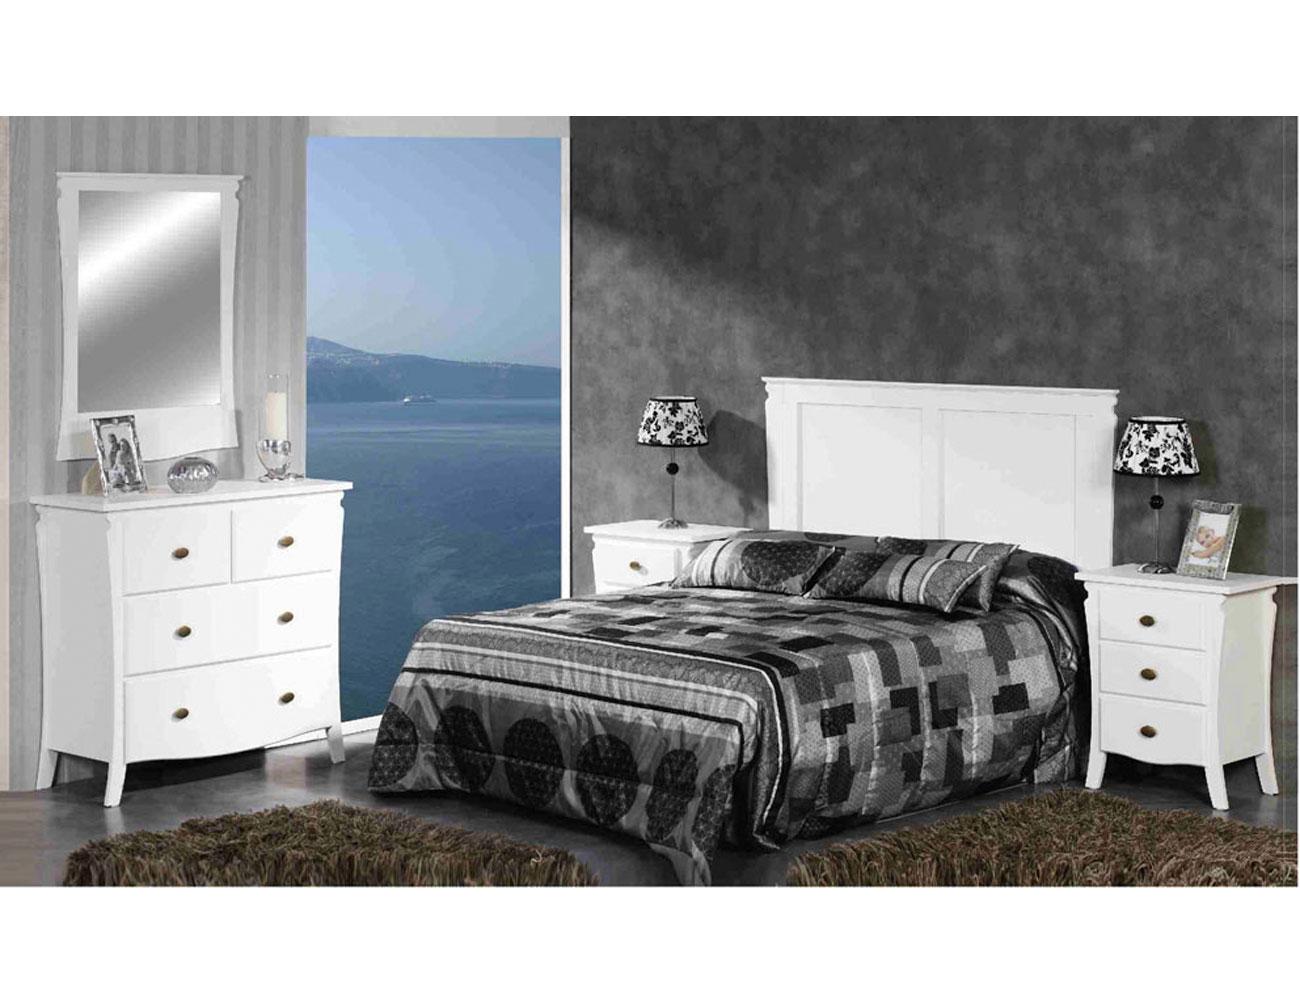 Dormitorio matrimonio blanco lacado madera dm4